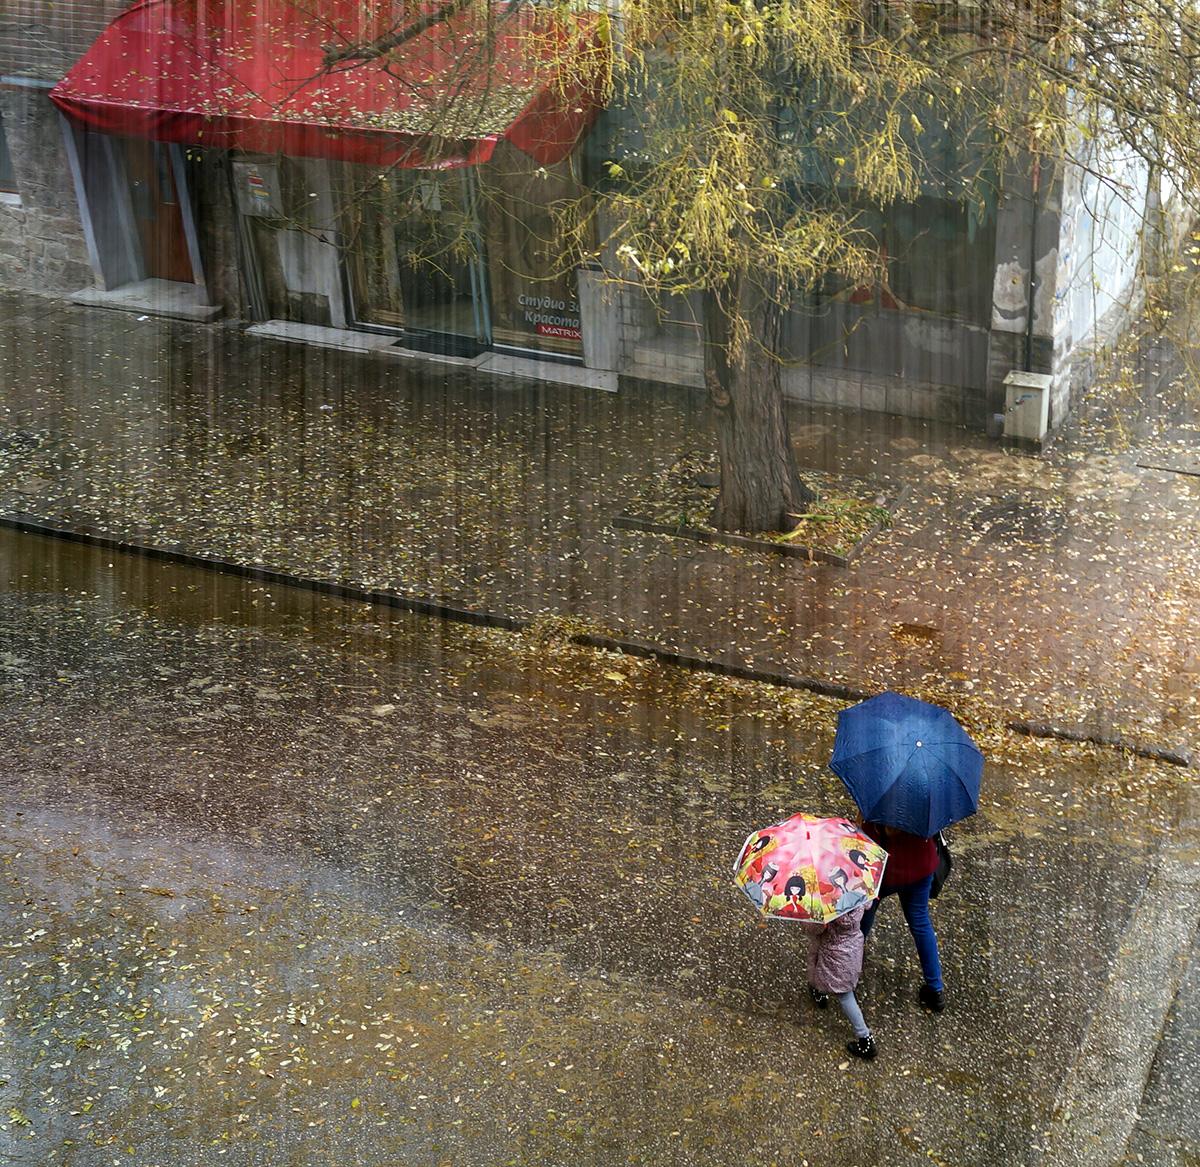 Photo in Everything else | Author nicnic  - nn2 | PHOTO FORUM